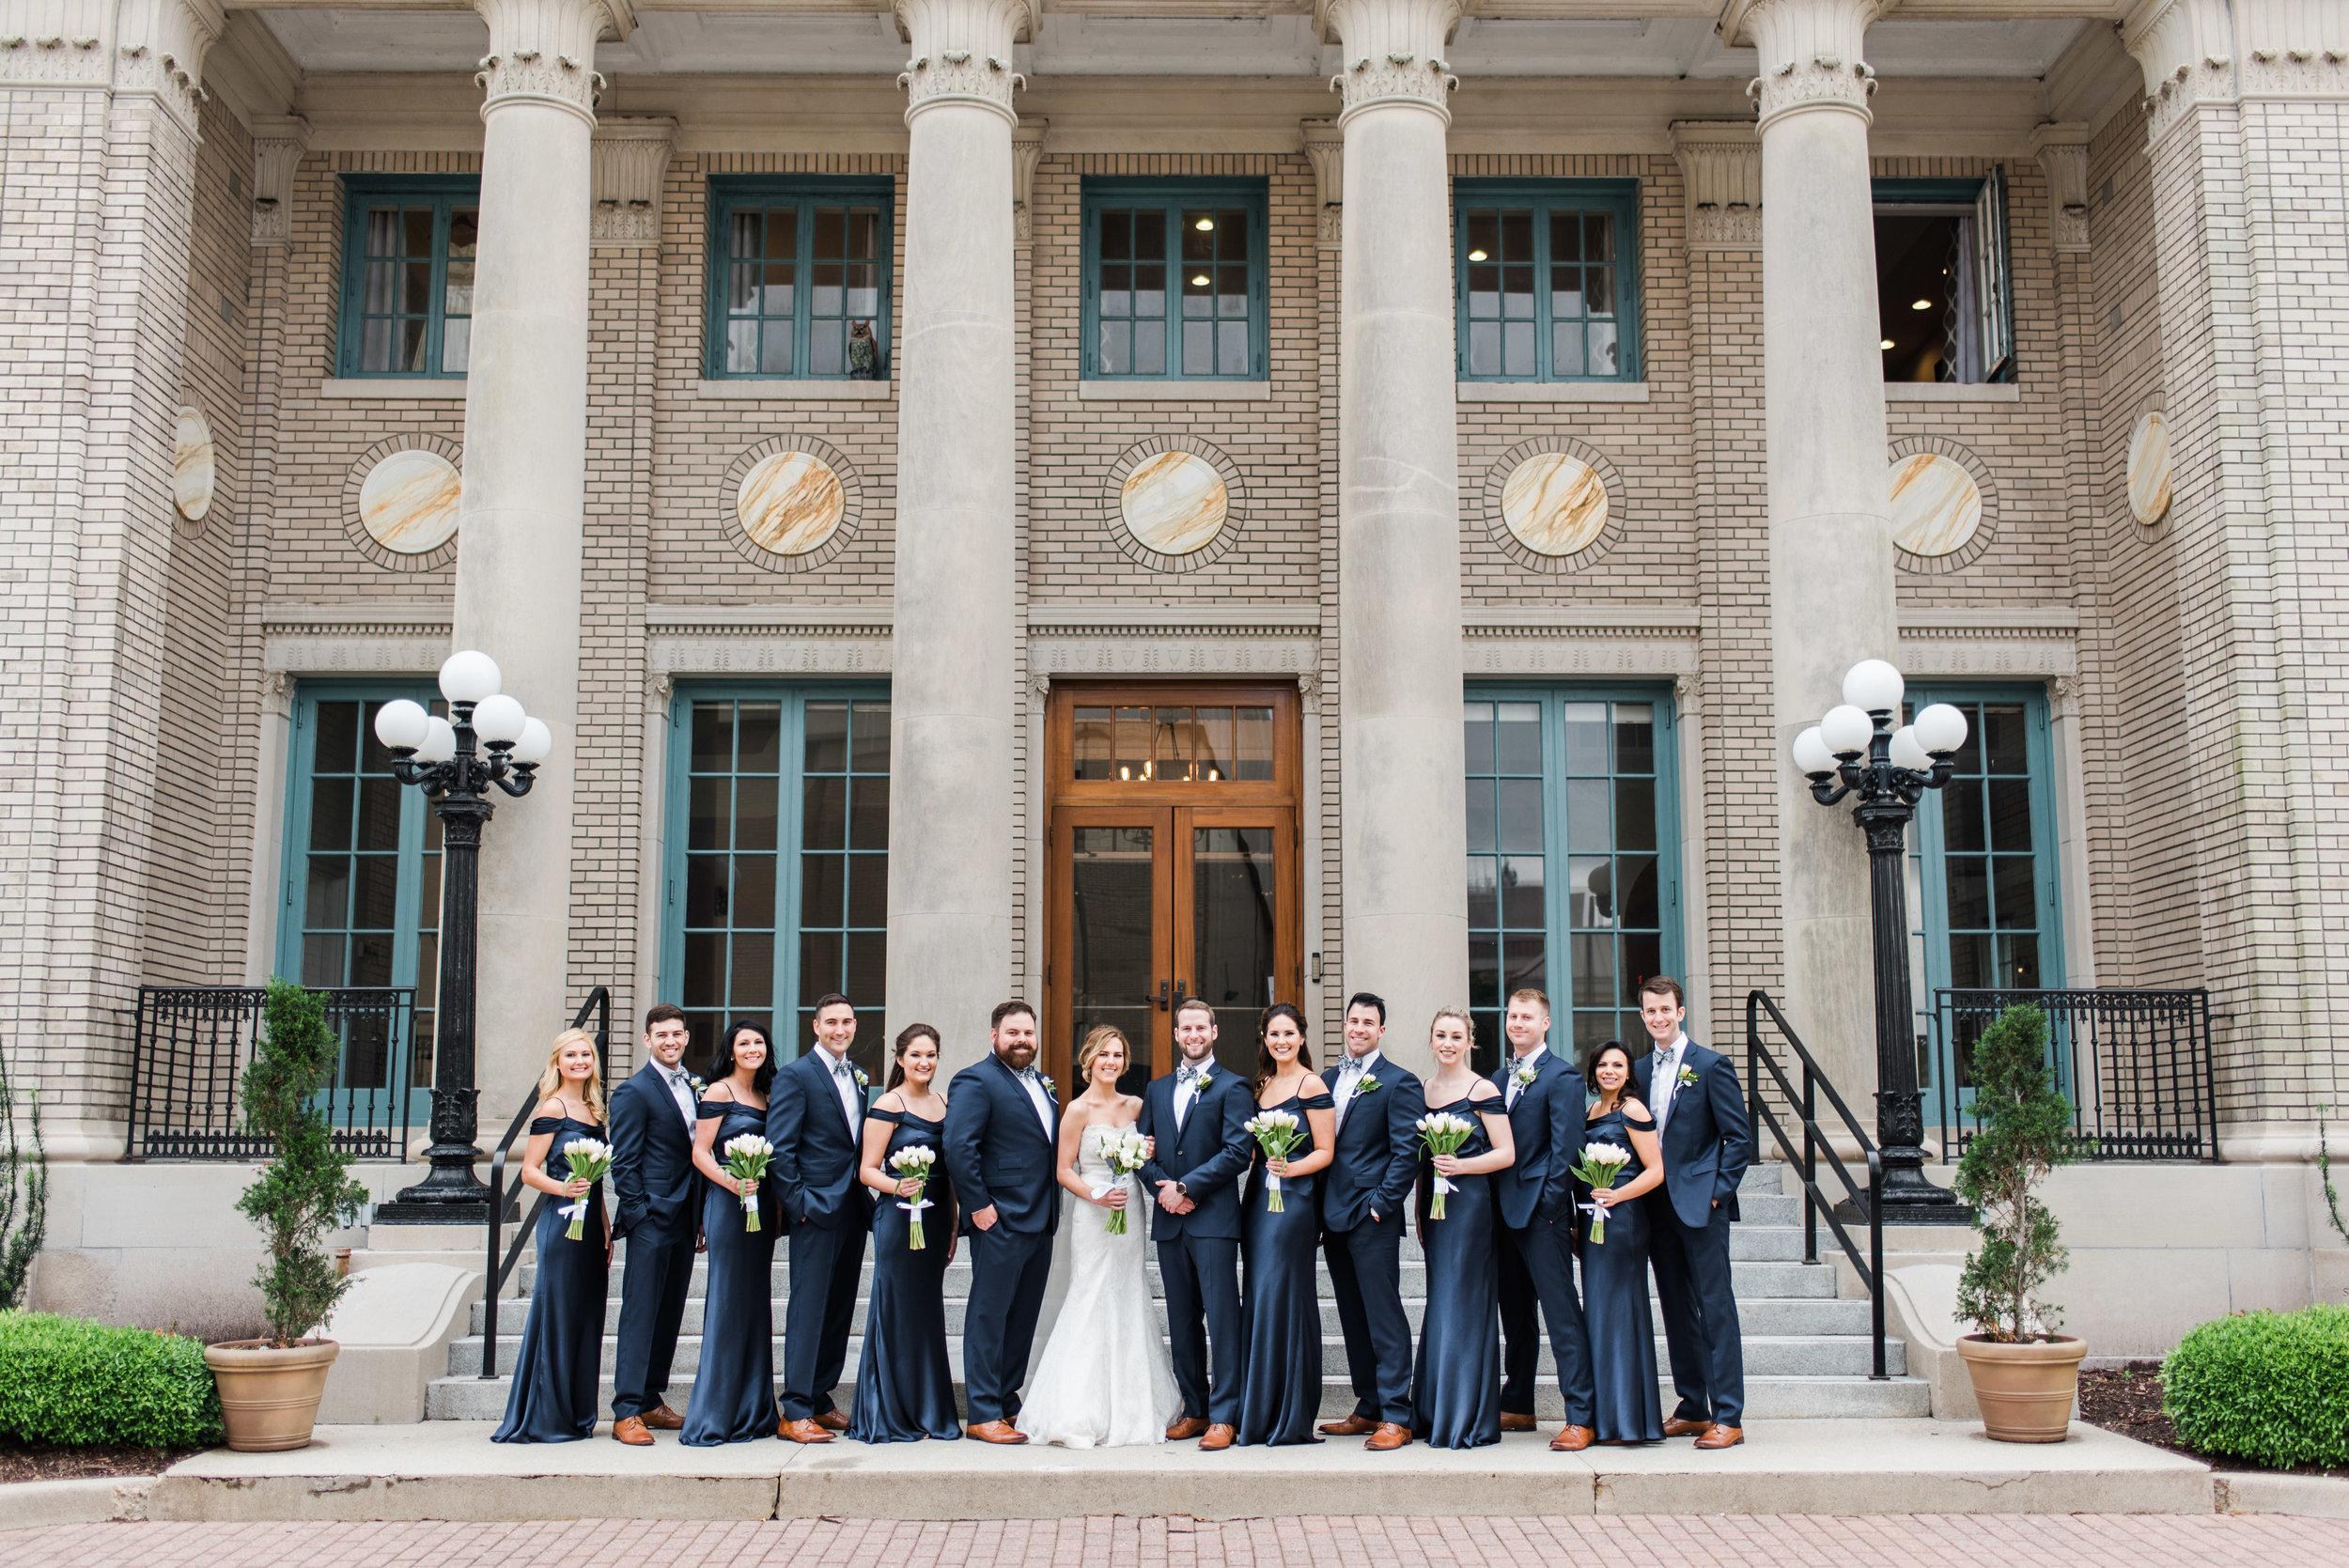 gray-door-photography-wedding-portraits-dallas-photographer-steph-erffmeyer4.jpg